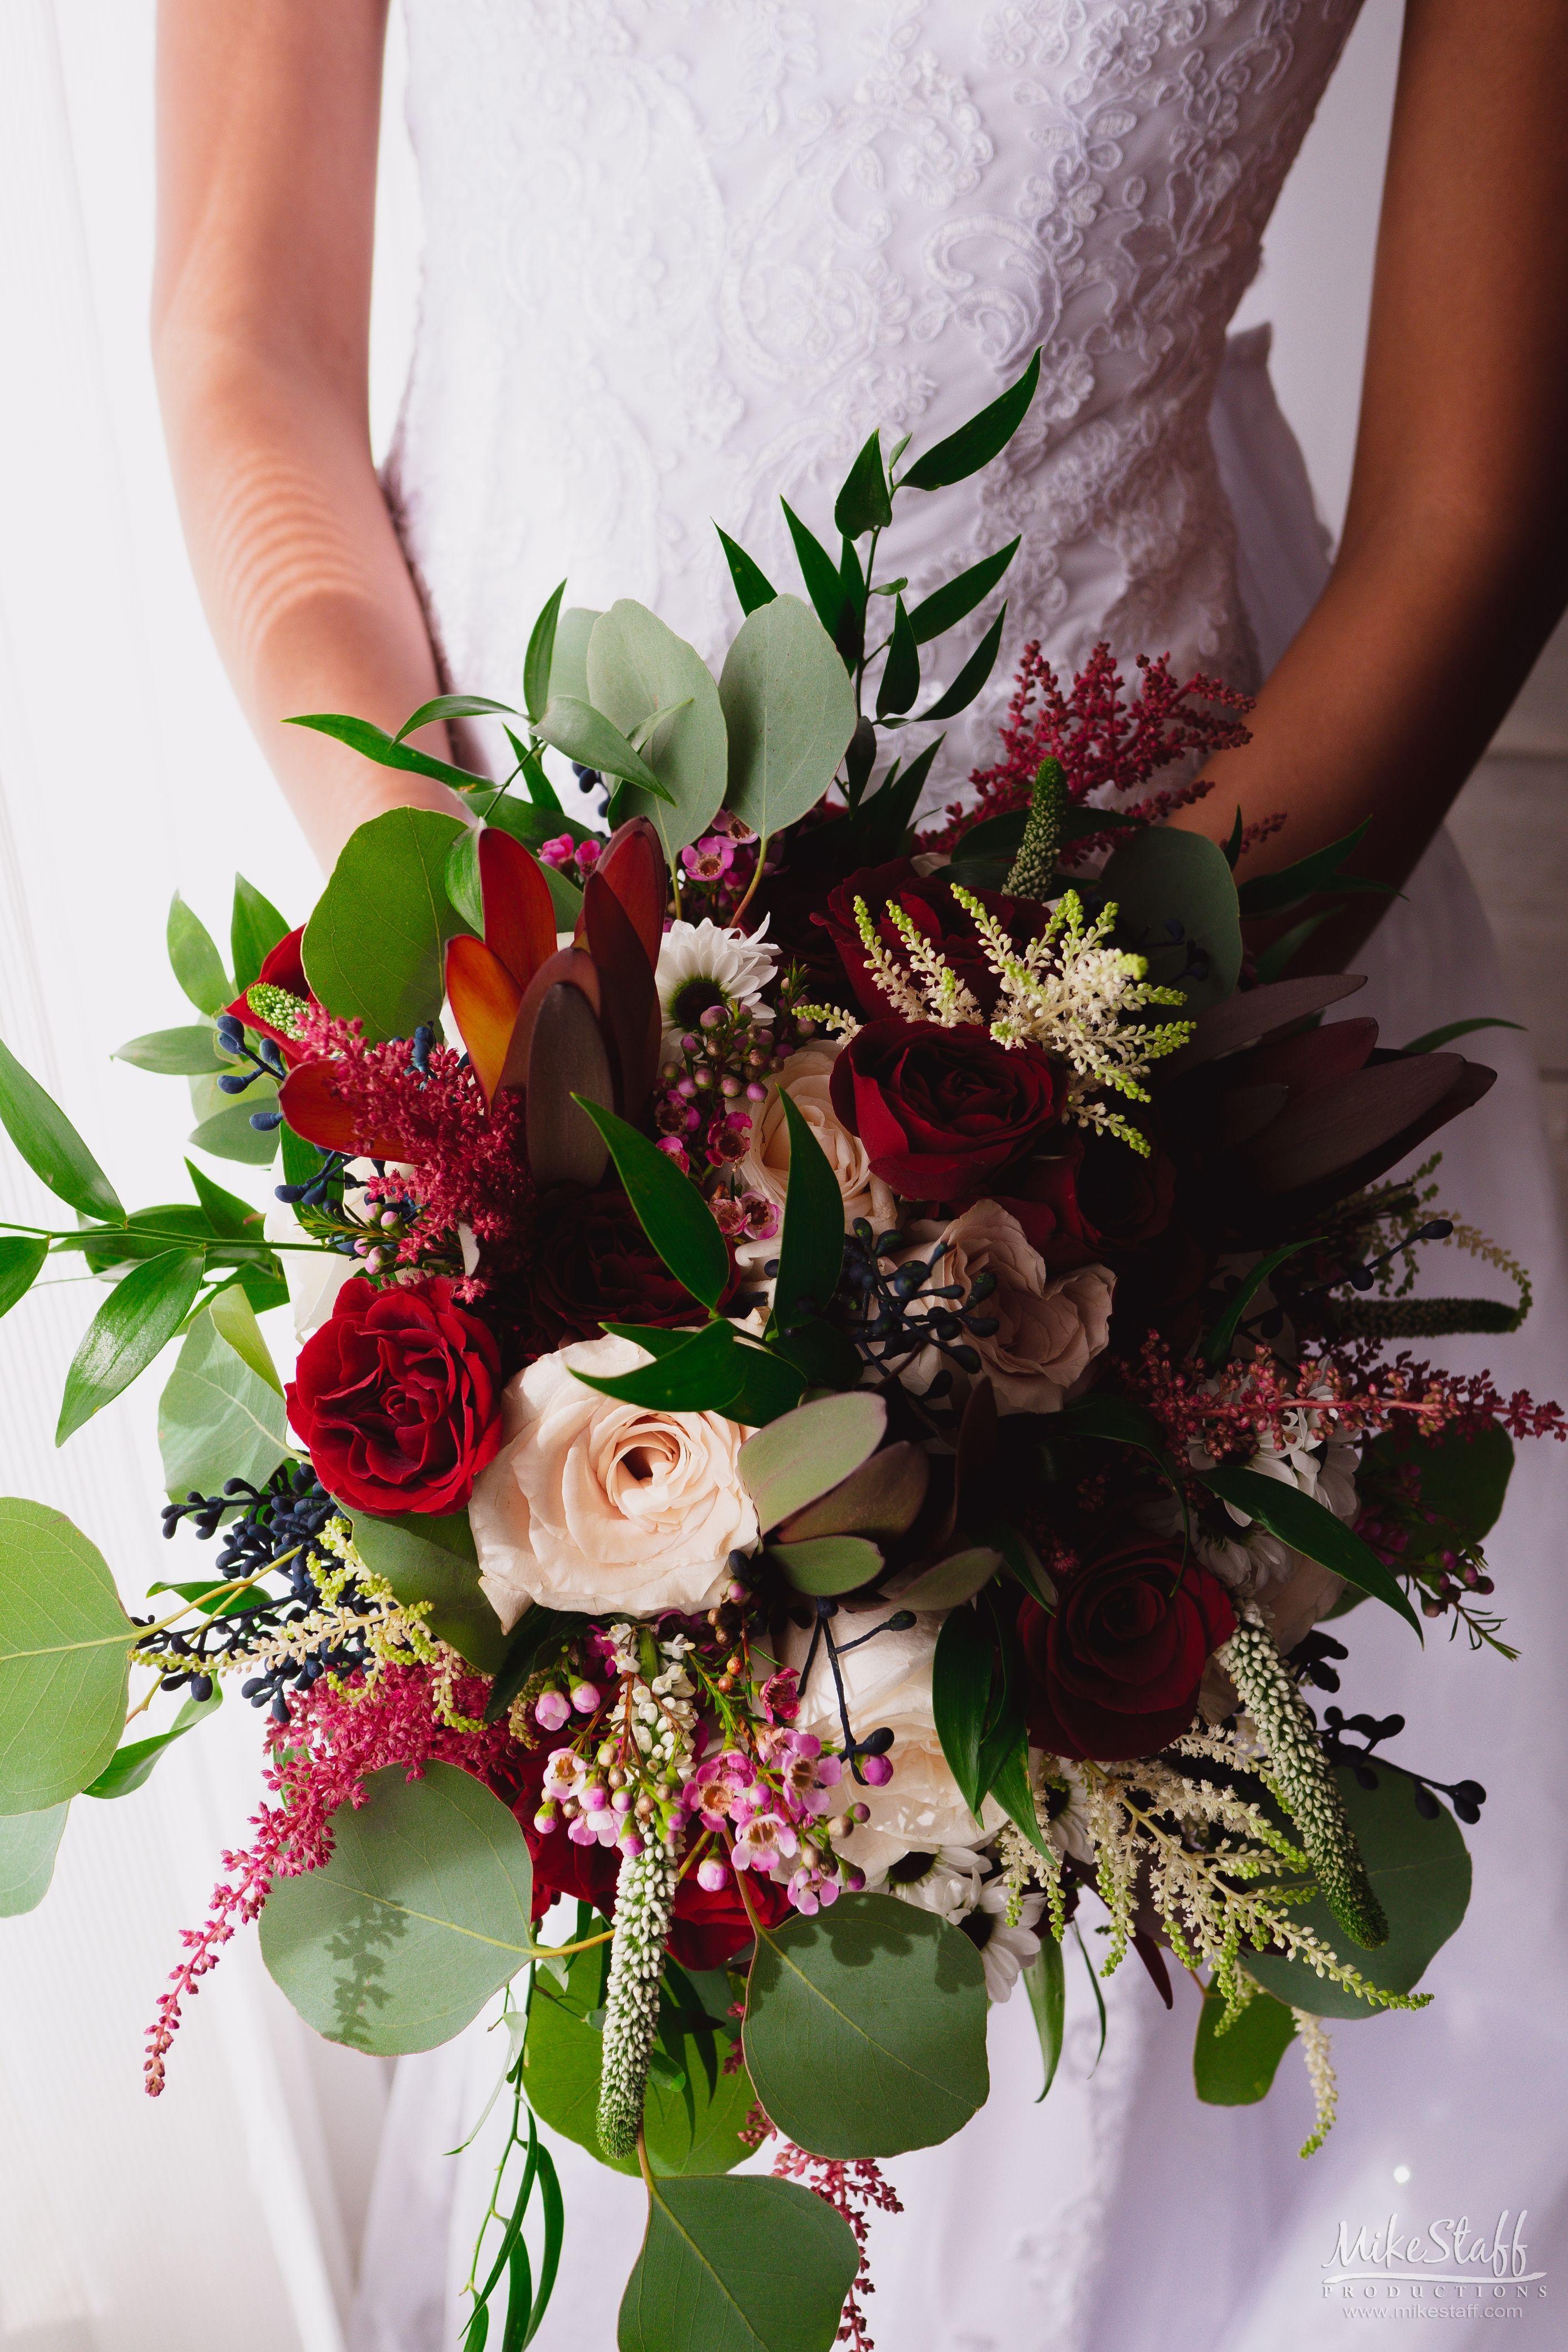 Save Money On Your Wedding 15 Great Money Saving Tips Wedding Bouquets Wedding Bridal Bouquets Save Money Wedding